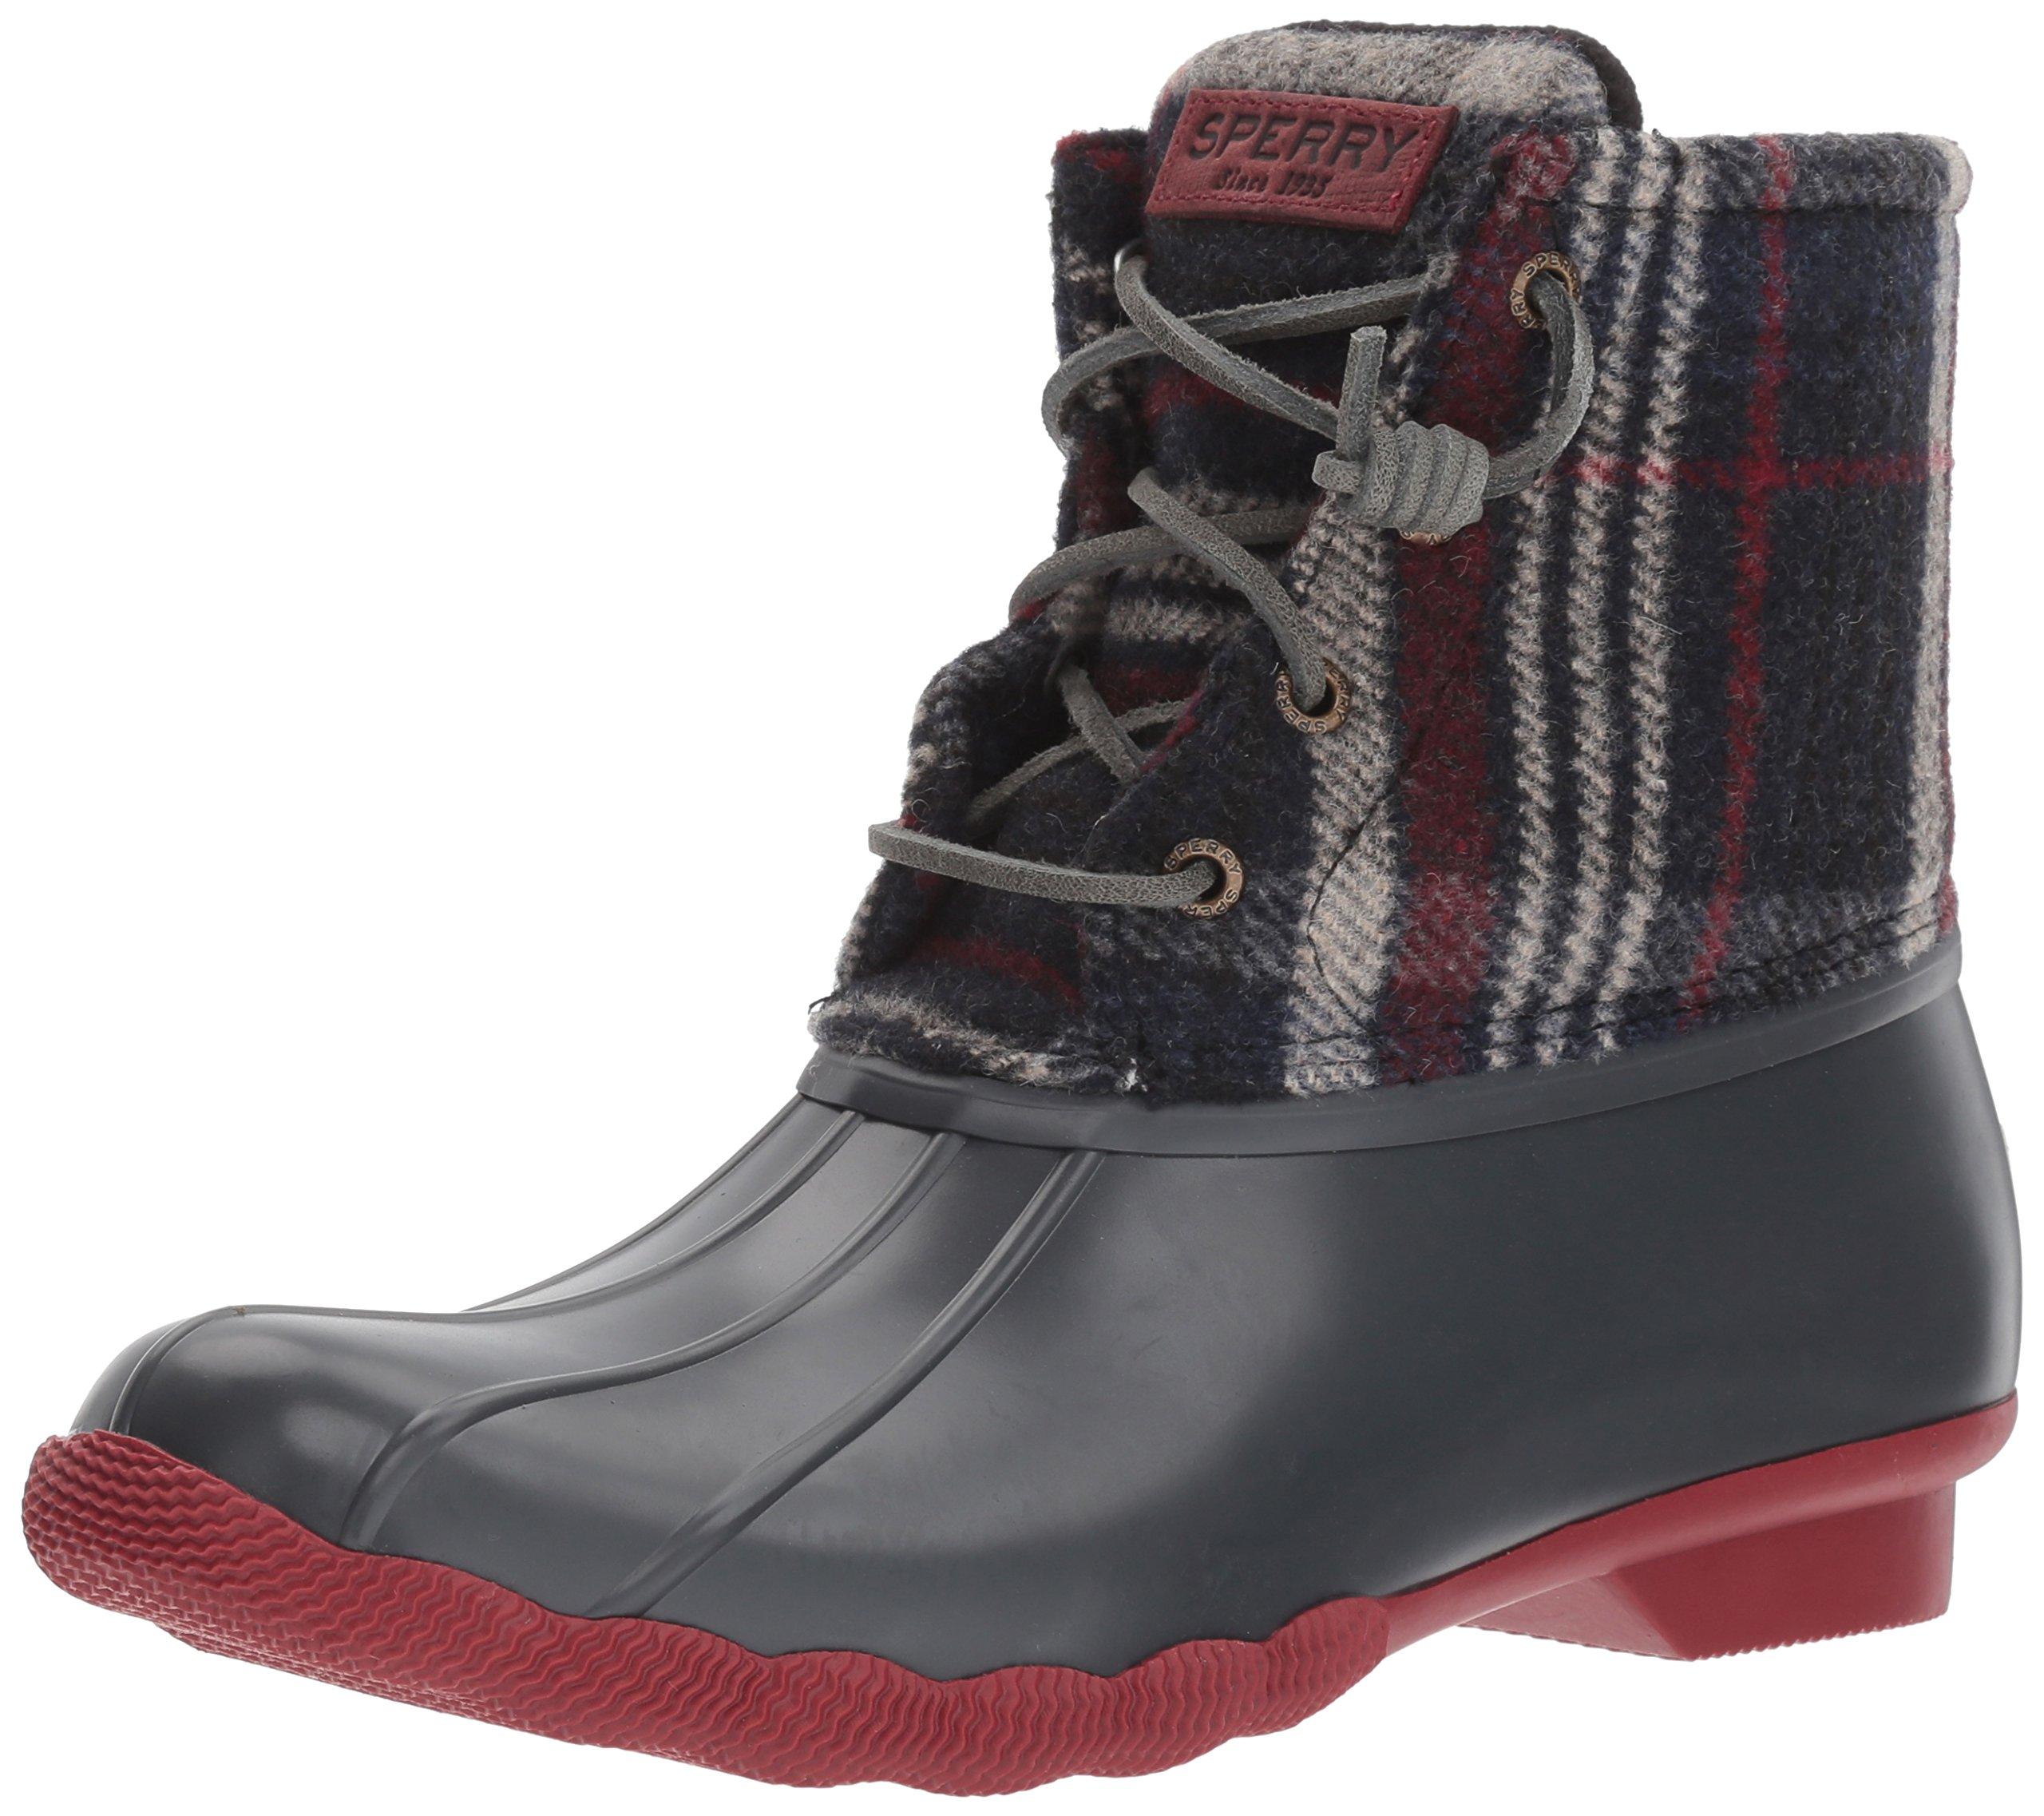 Sperry Top-Sider Women's Saltwater Wool Plaid Rain Boot, Grey, 5 Medium US